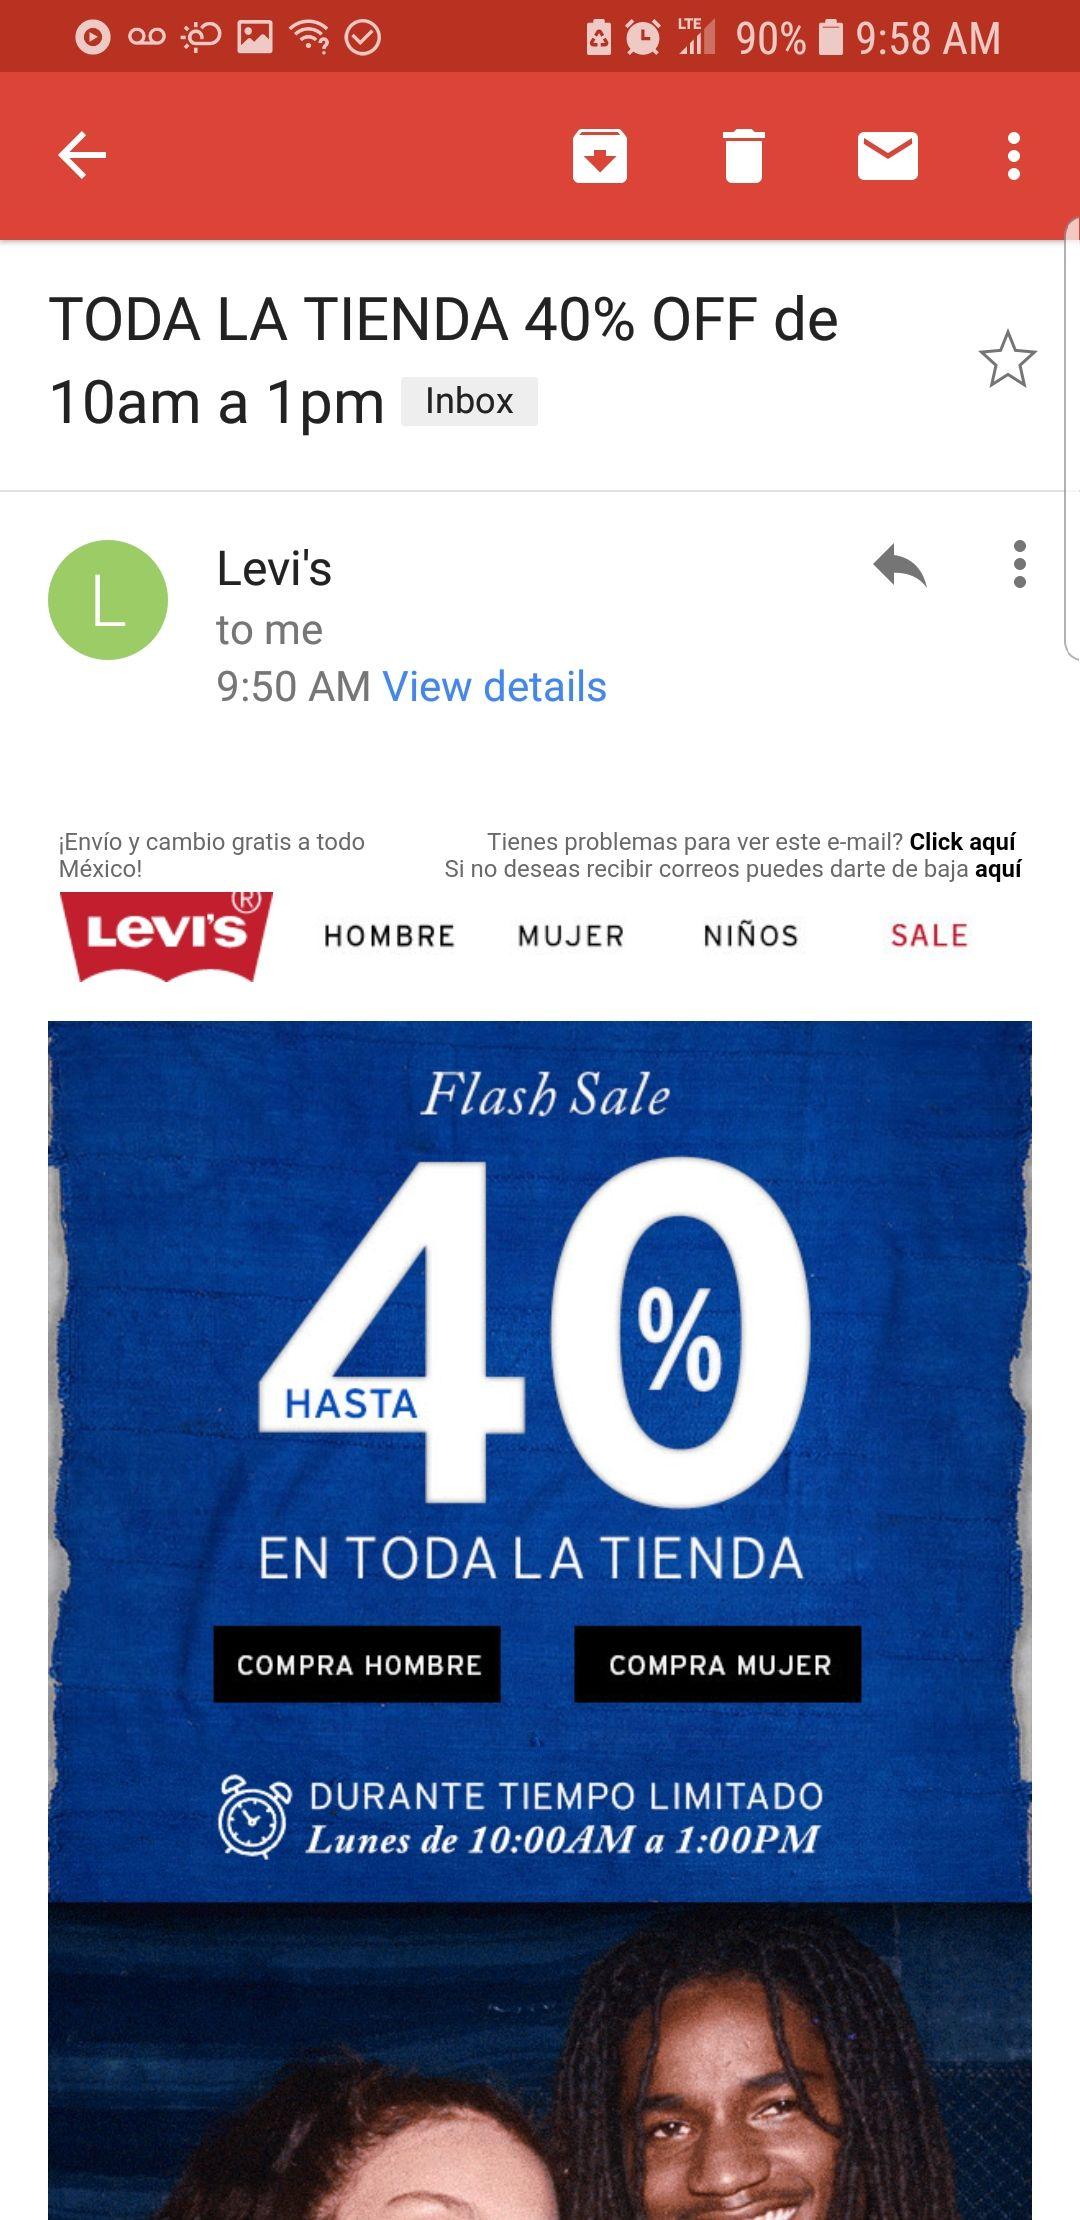 Cyber Monday en Levi's: 40% toda la tienda de 10am a 1pm